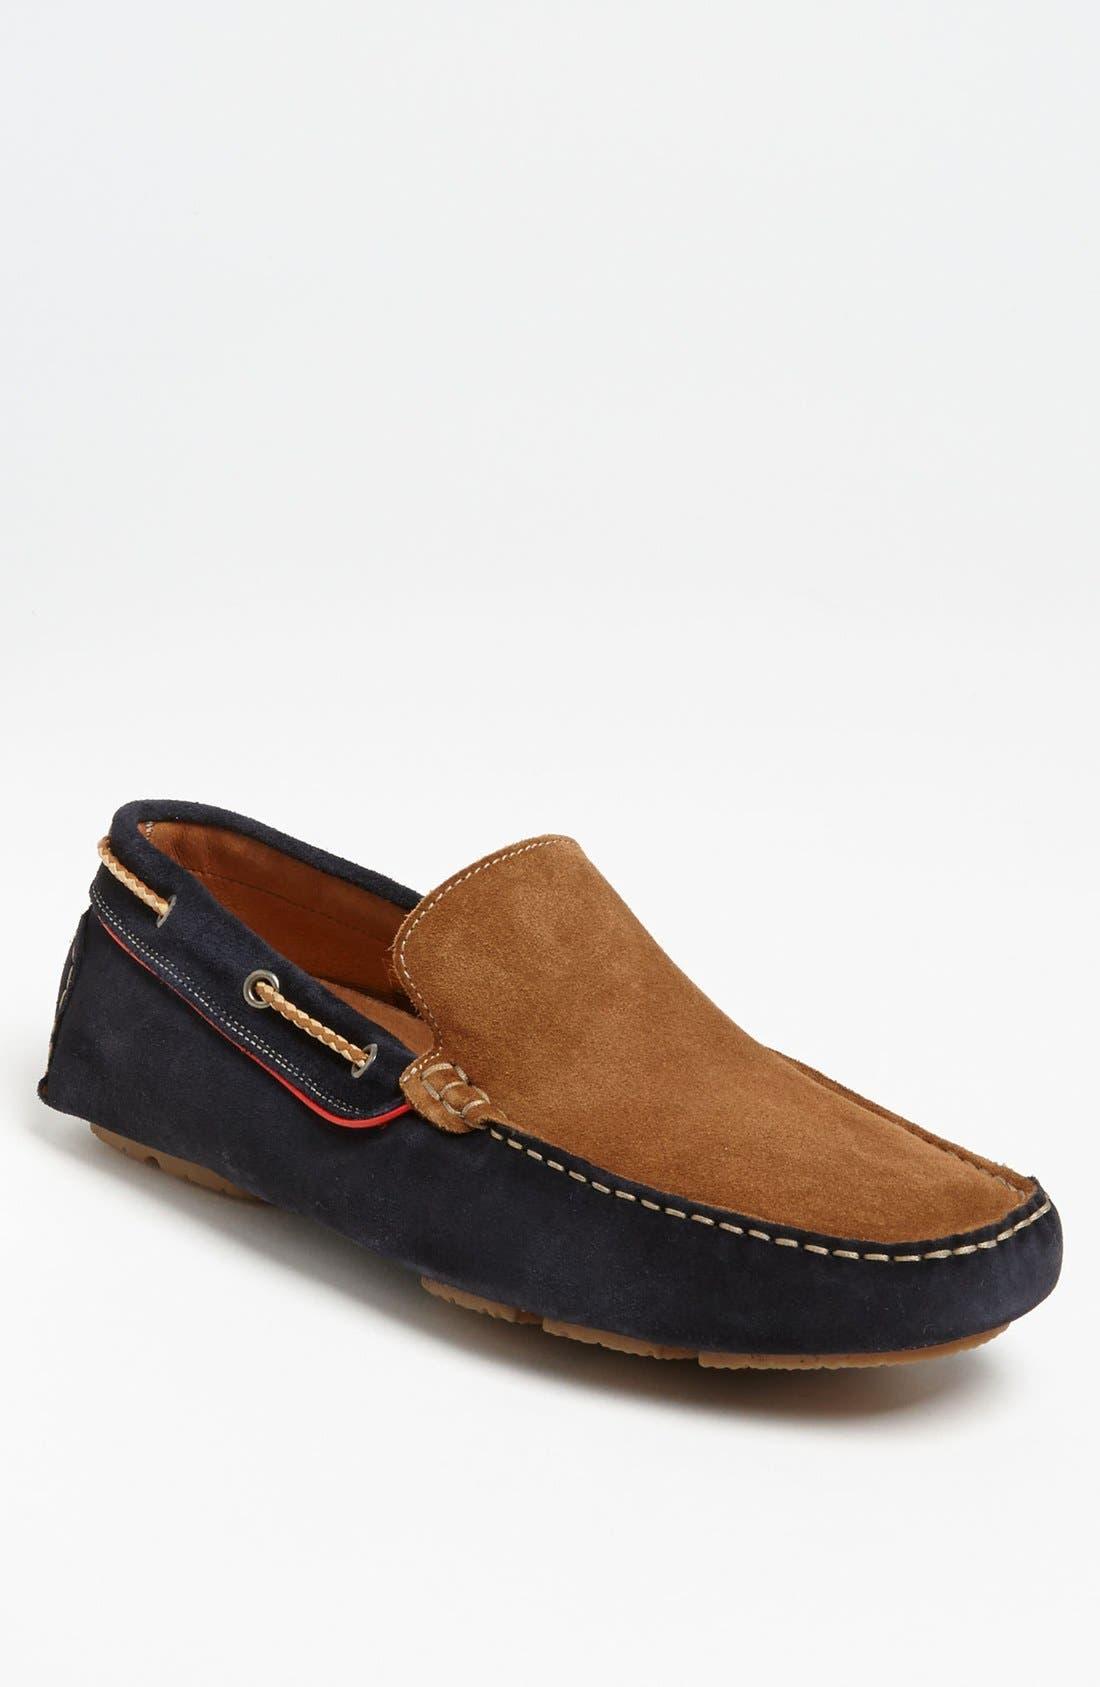 Alternate Image 1 Selected - Bacco Bucci 'Adani' Driving Shoe